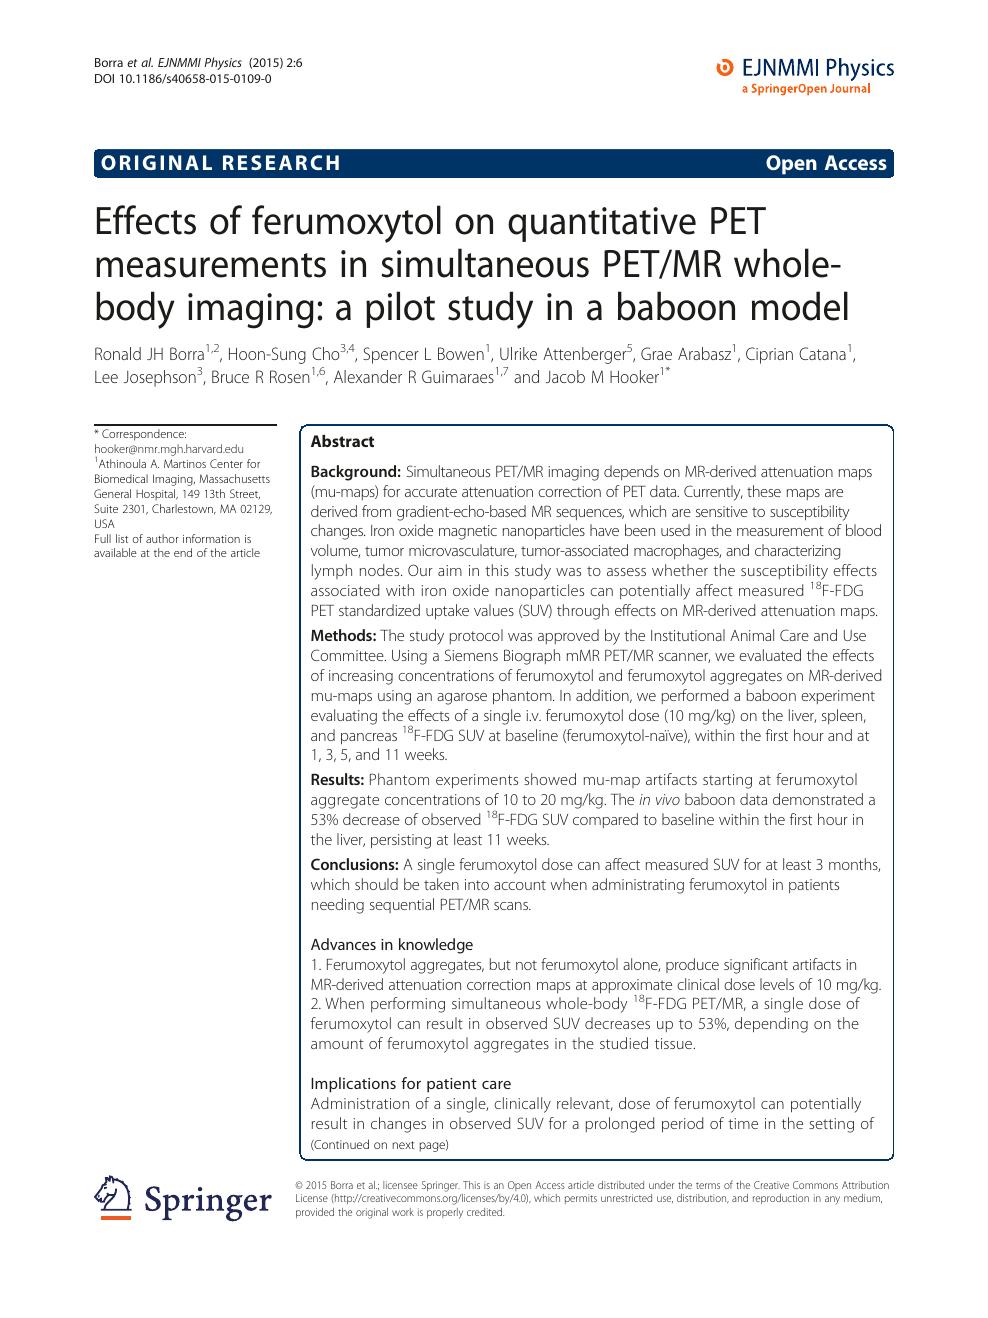 Effects of ferumoxytol on quantitative PET measurements in